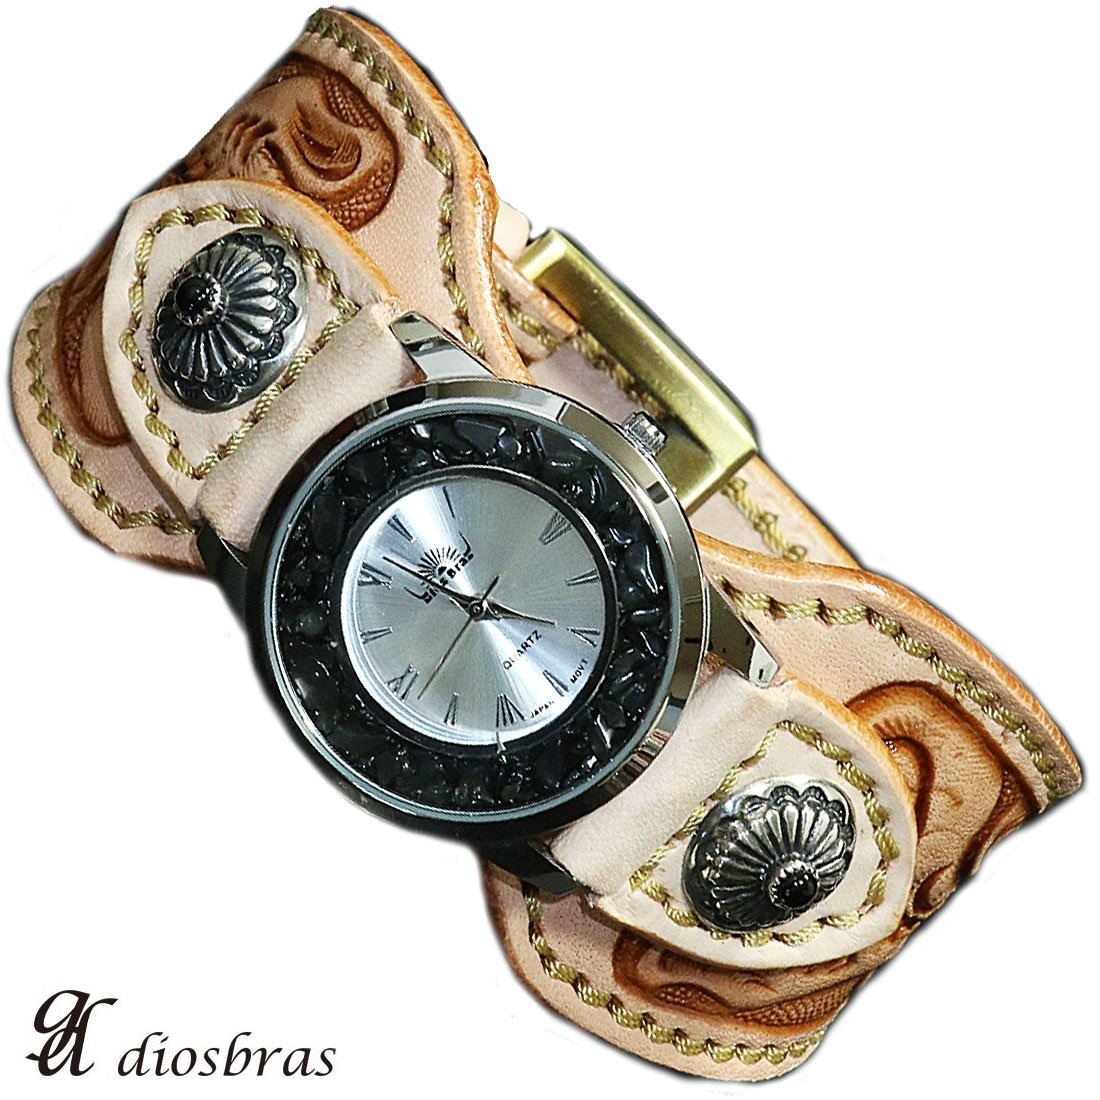 【diosbras-ディオブラス-】本革サドルレザー手彫りカービング カスタムウォッチ レザーウォッチ メンズ ベルト コンチョ 腕時計 シルバー925 ヌメ革 バイカー 牛革時計 インディアン  ナチュラル